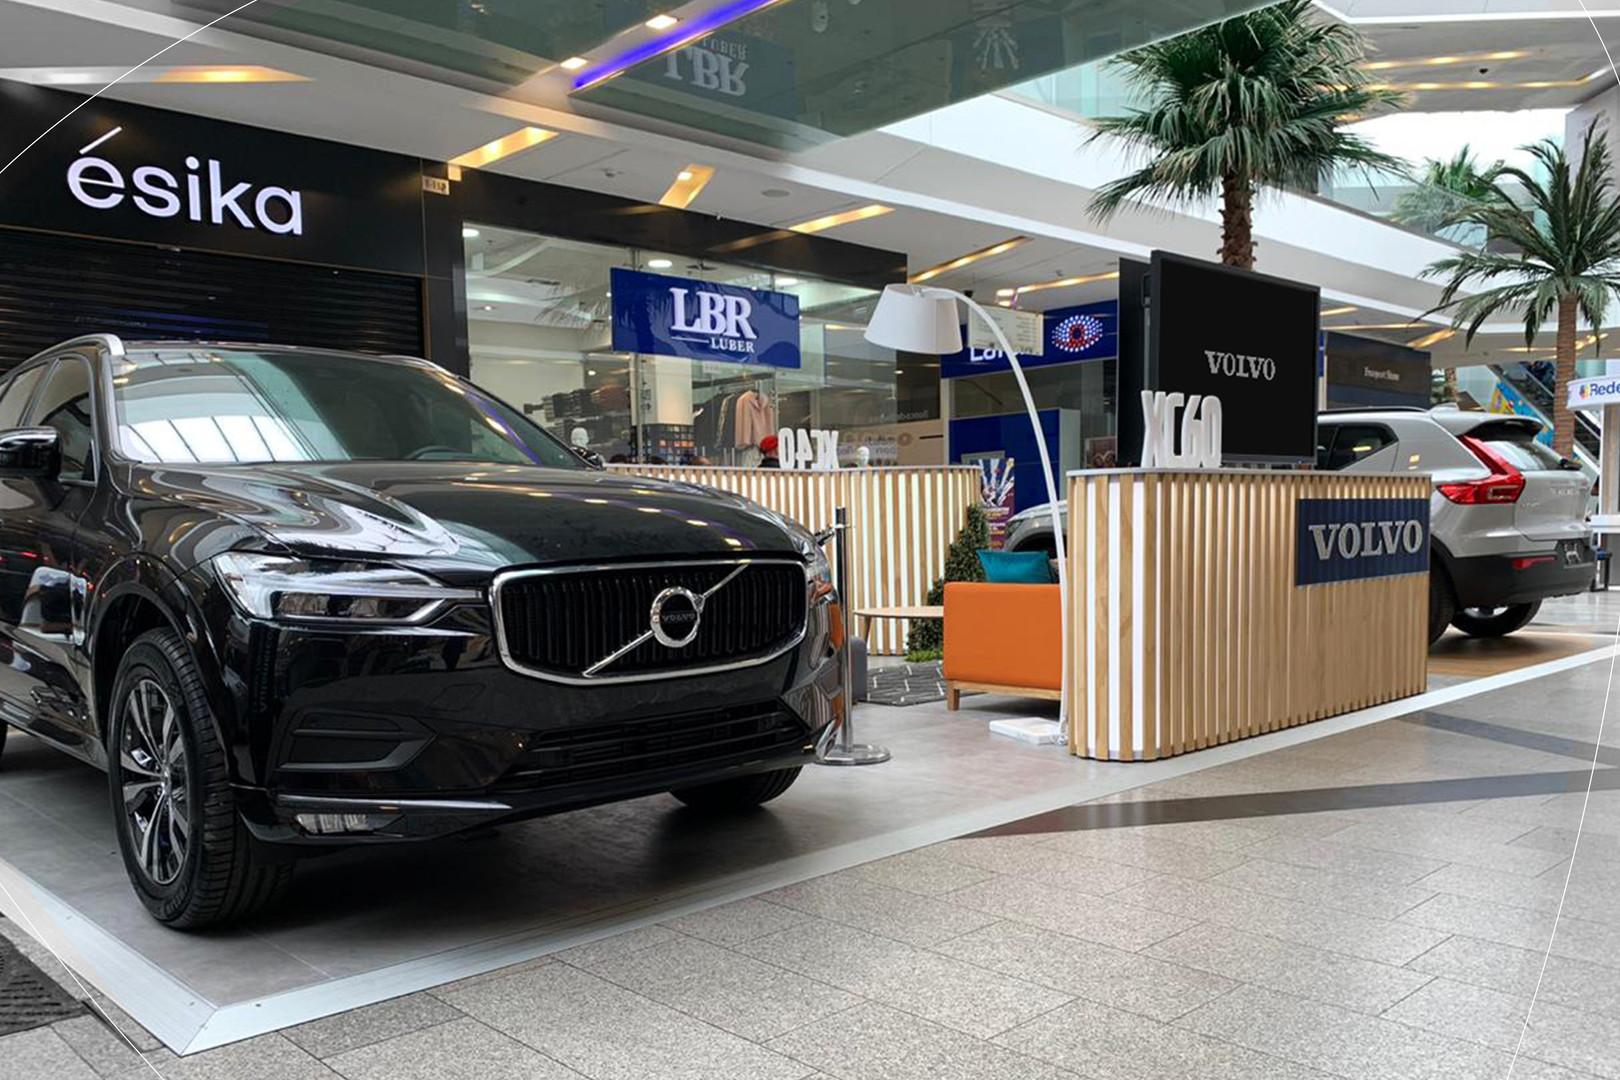 Volvo d51e35d2-4574-4338-97ec-21ce51cf5a